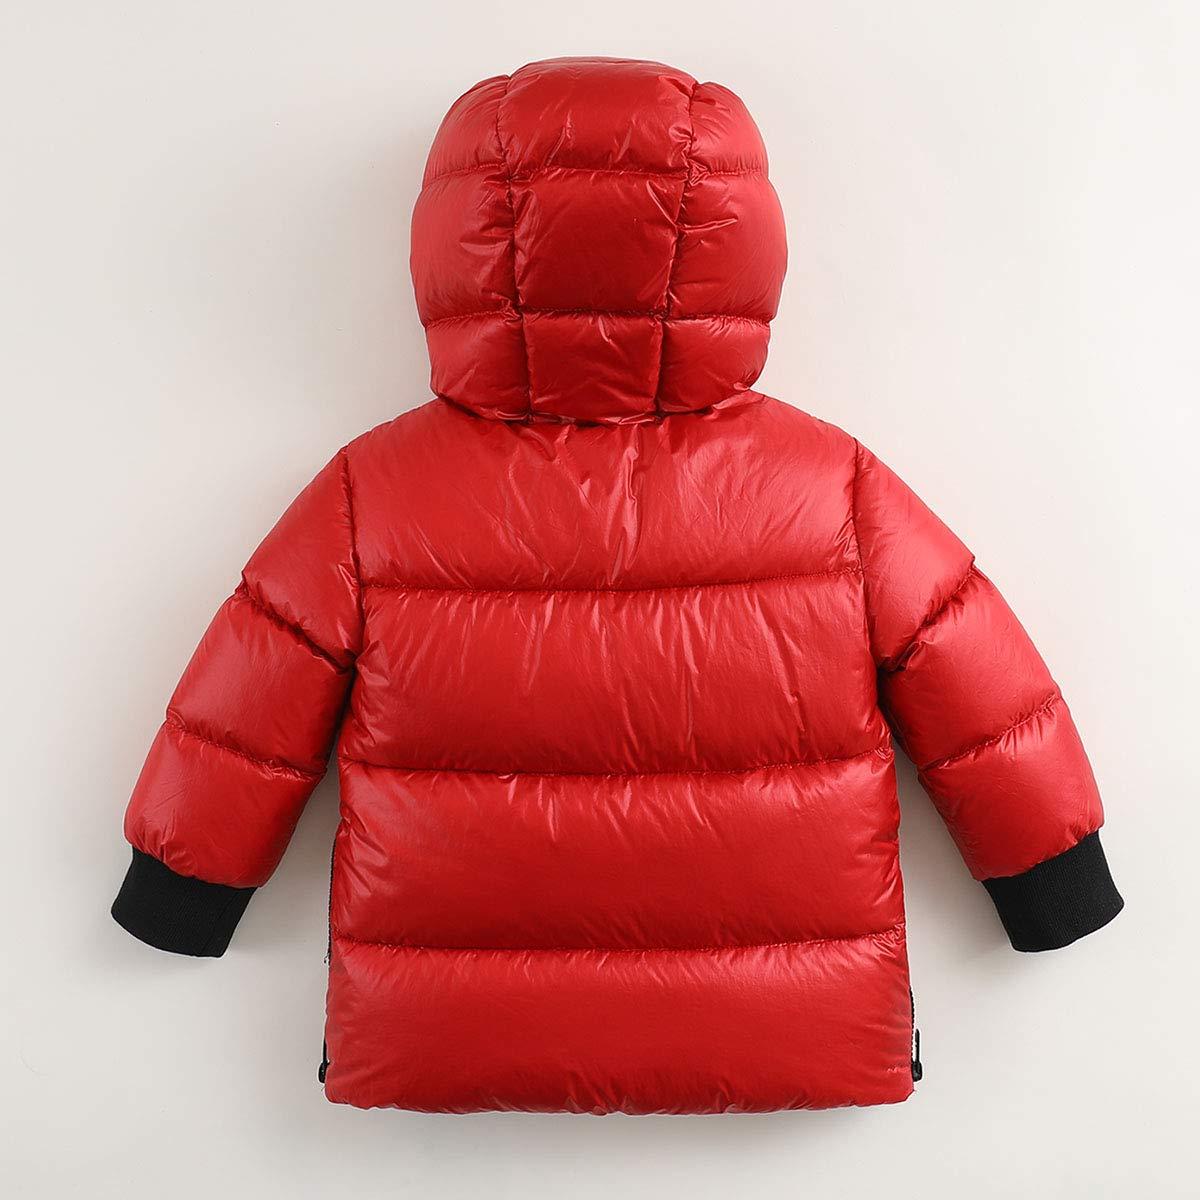 marc janie Boys Winter Thick Ultra Light Down Jacket